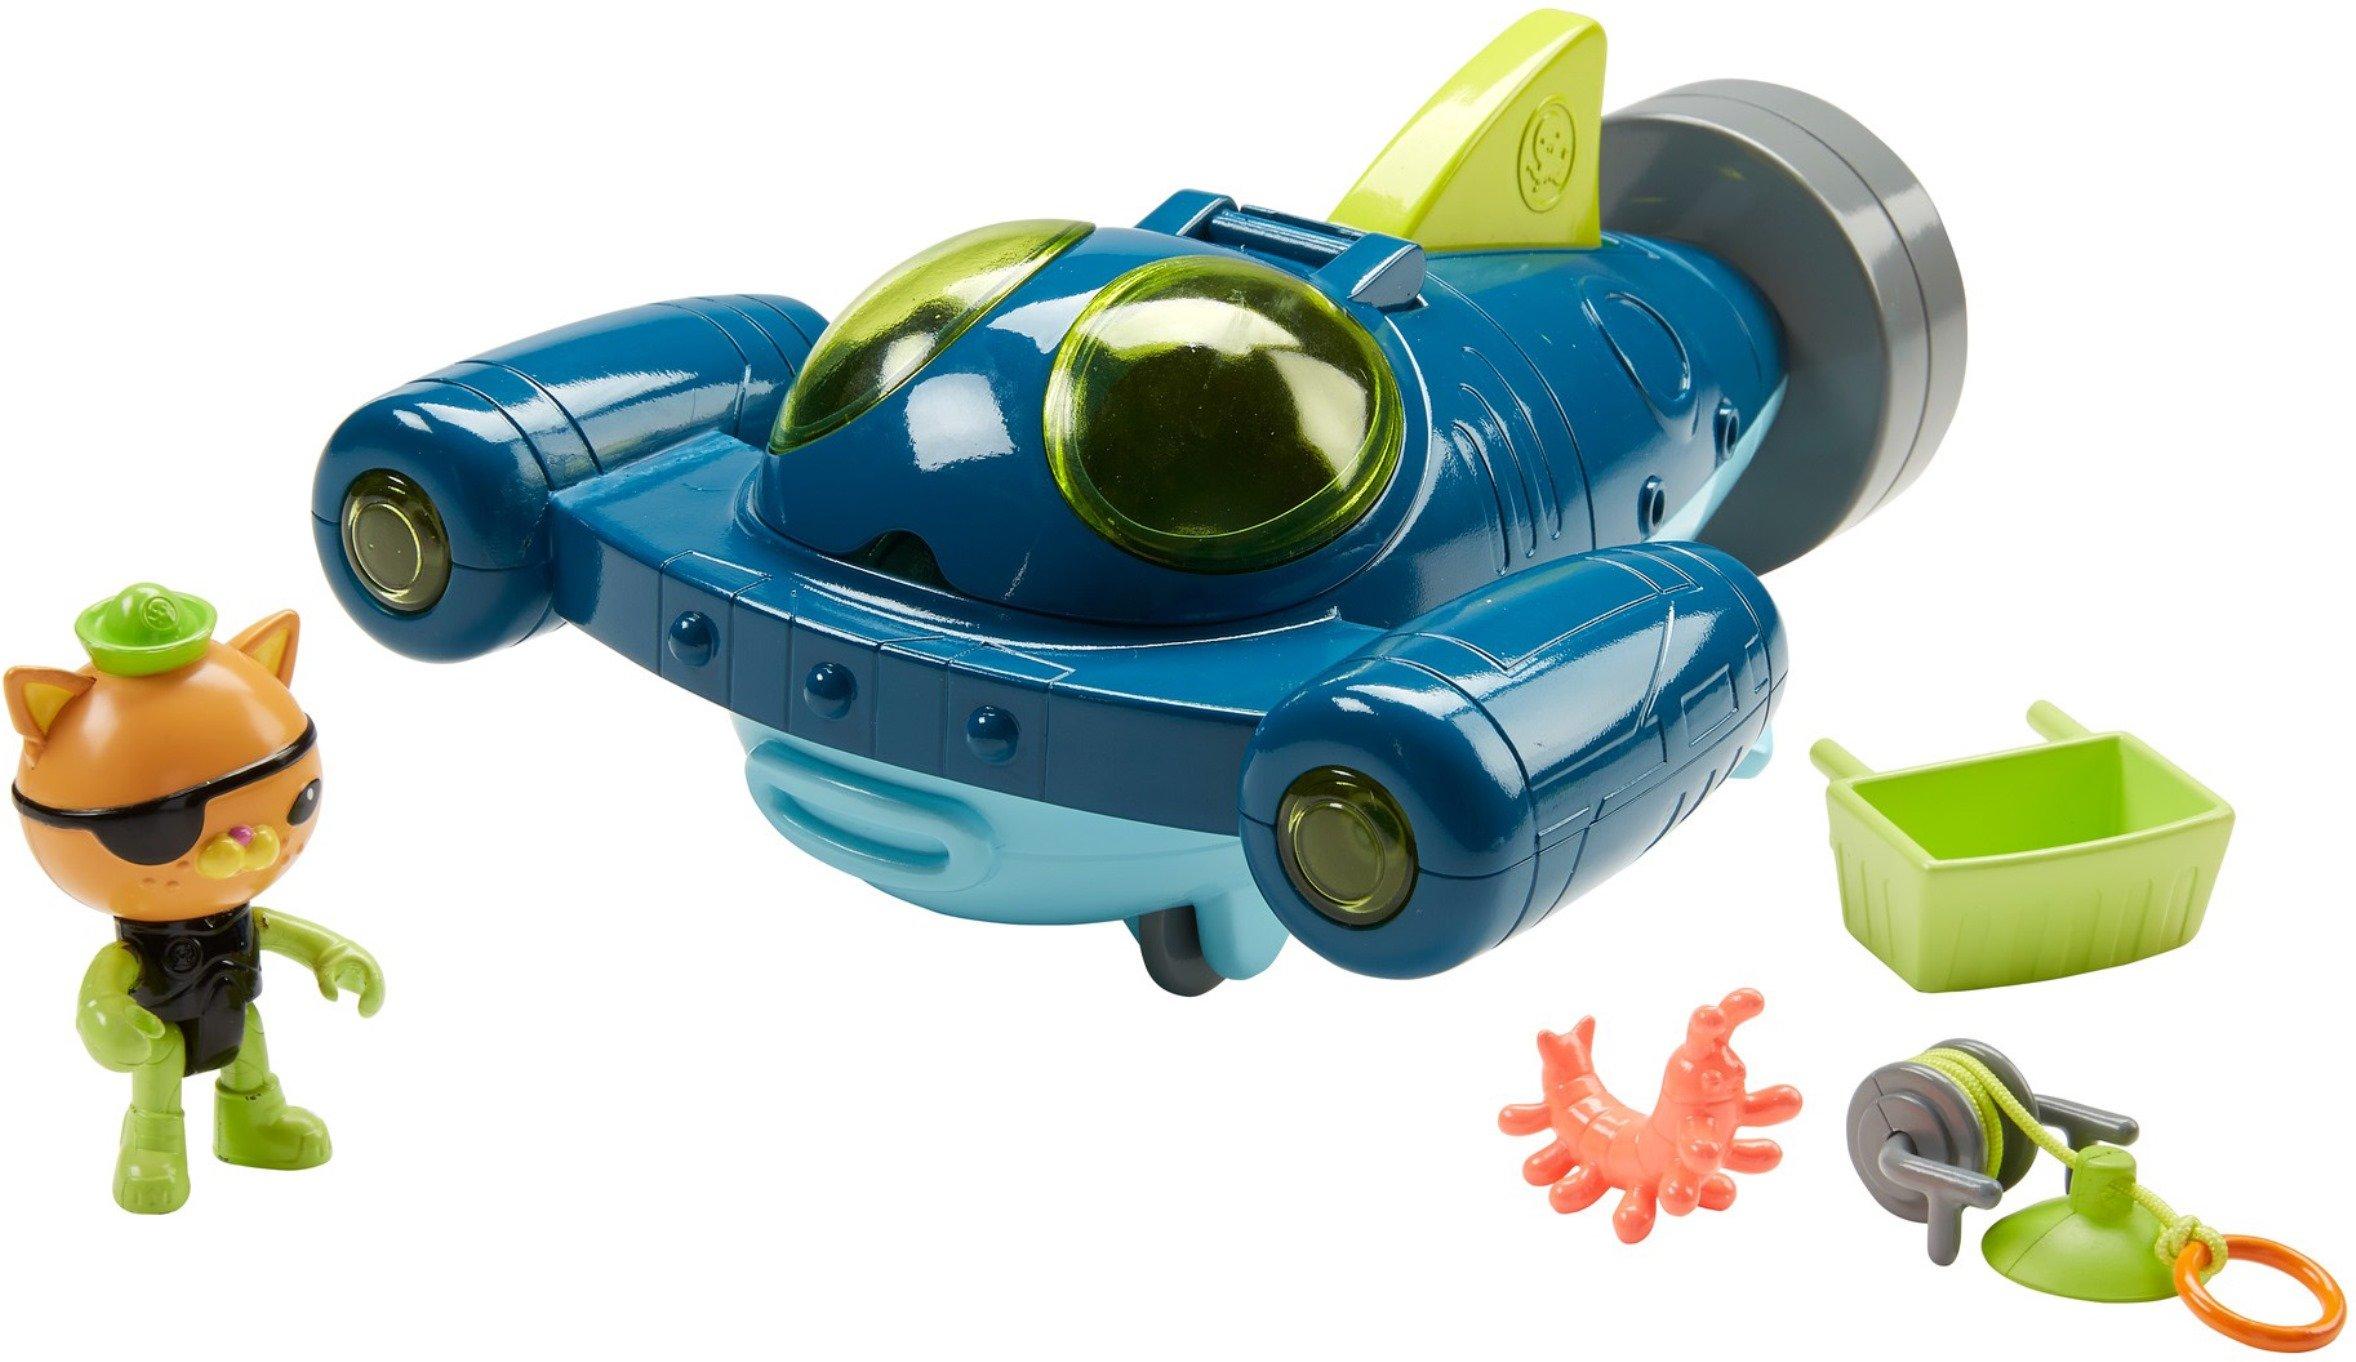 Fisher-Price Octonauts Gup-Q Undersea Explorer